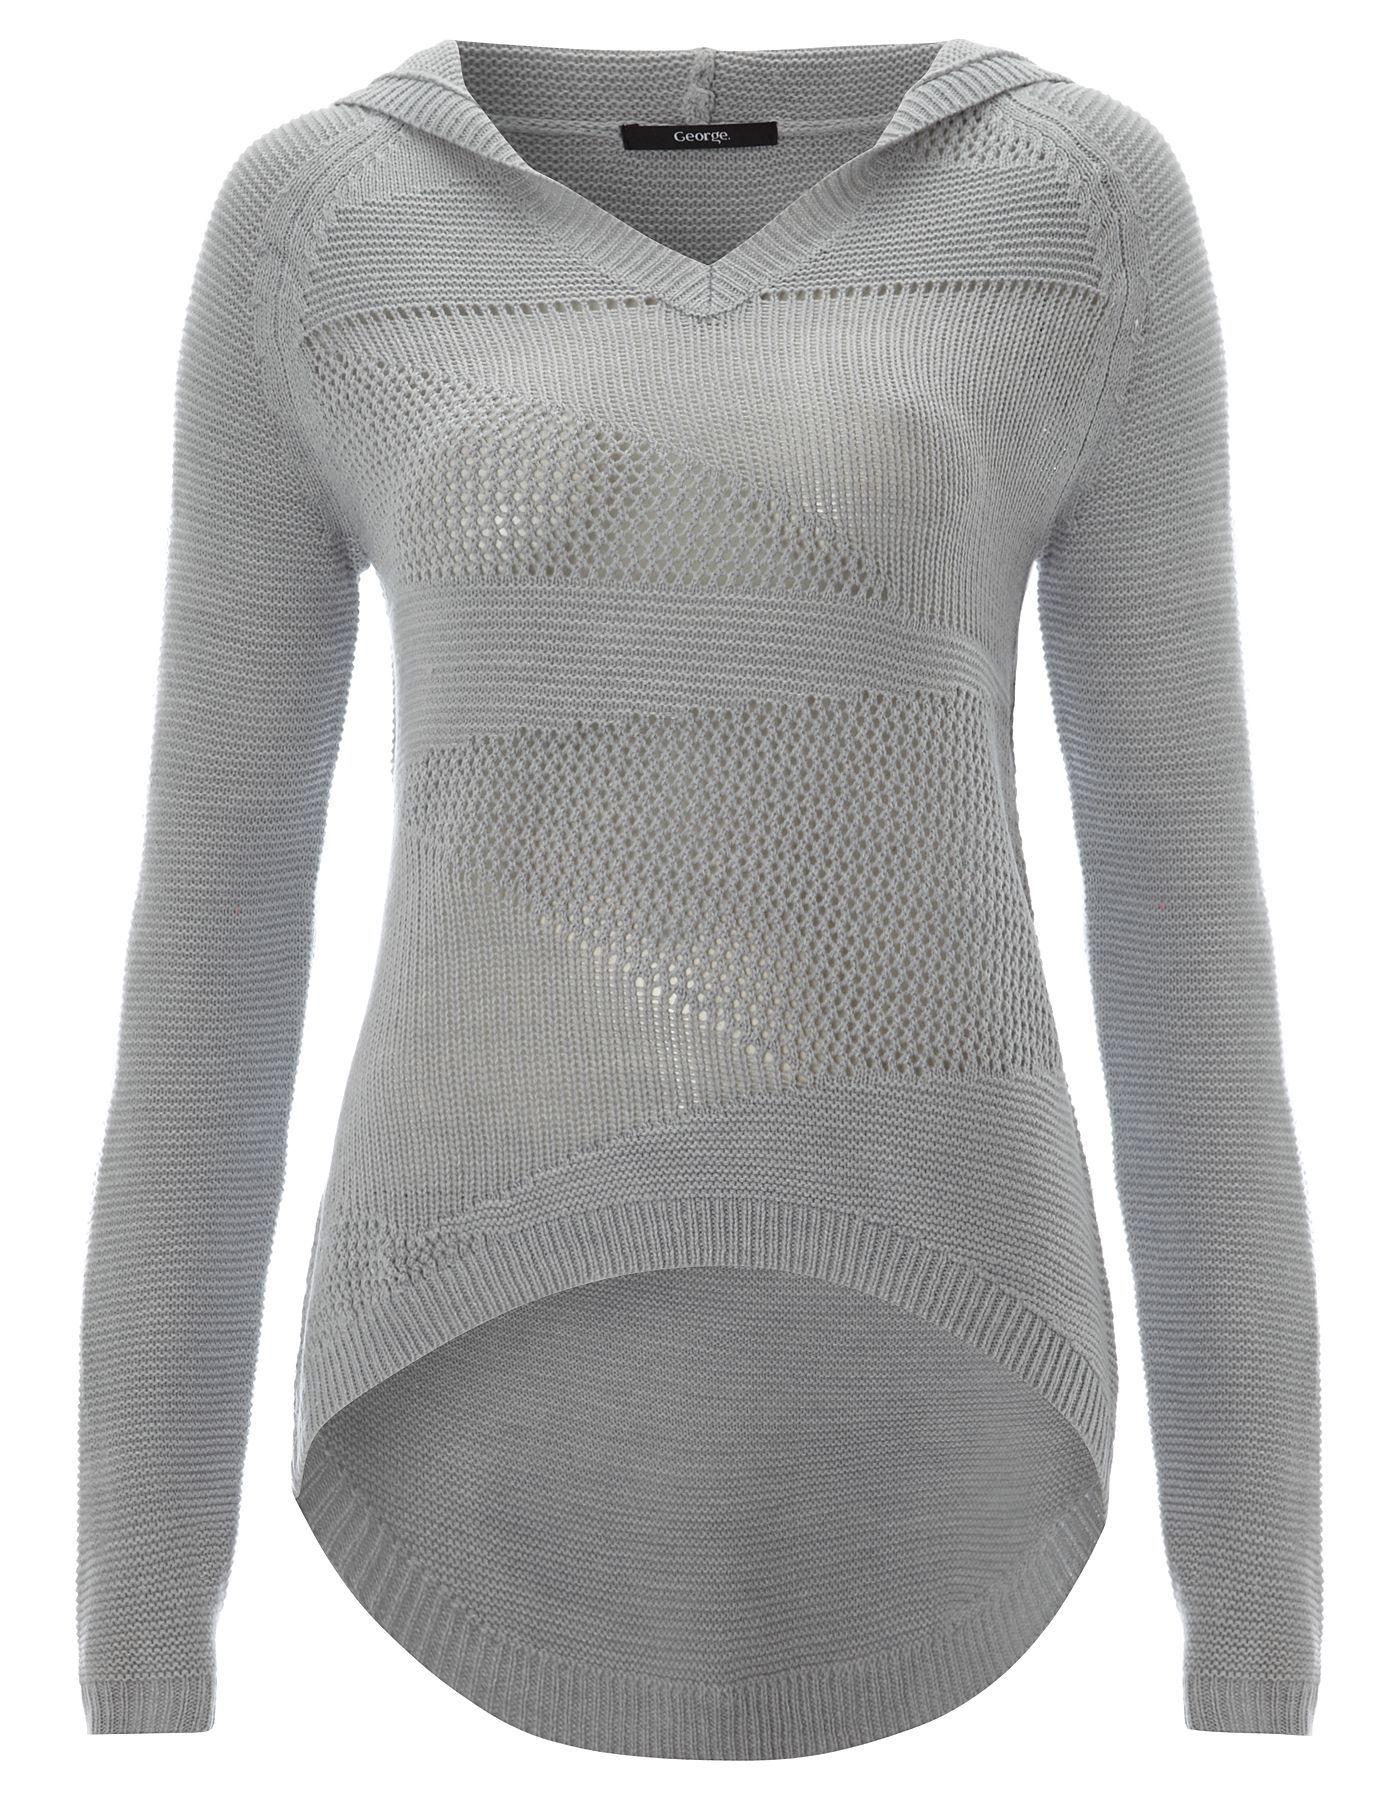 Black t shirt asda - Hooded Knit Jumper Women George At Asda